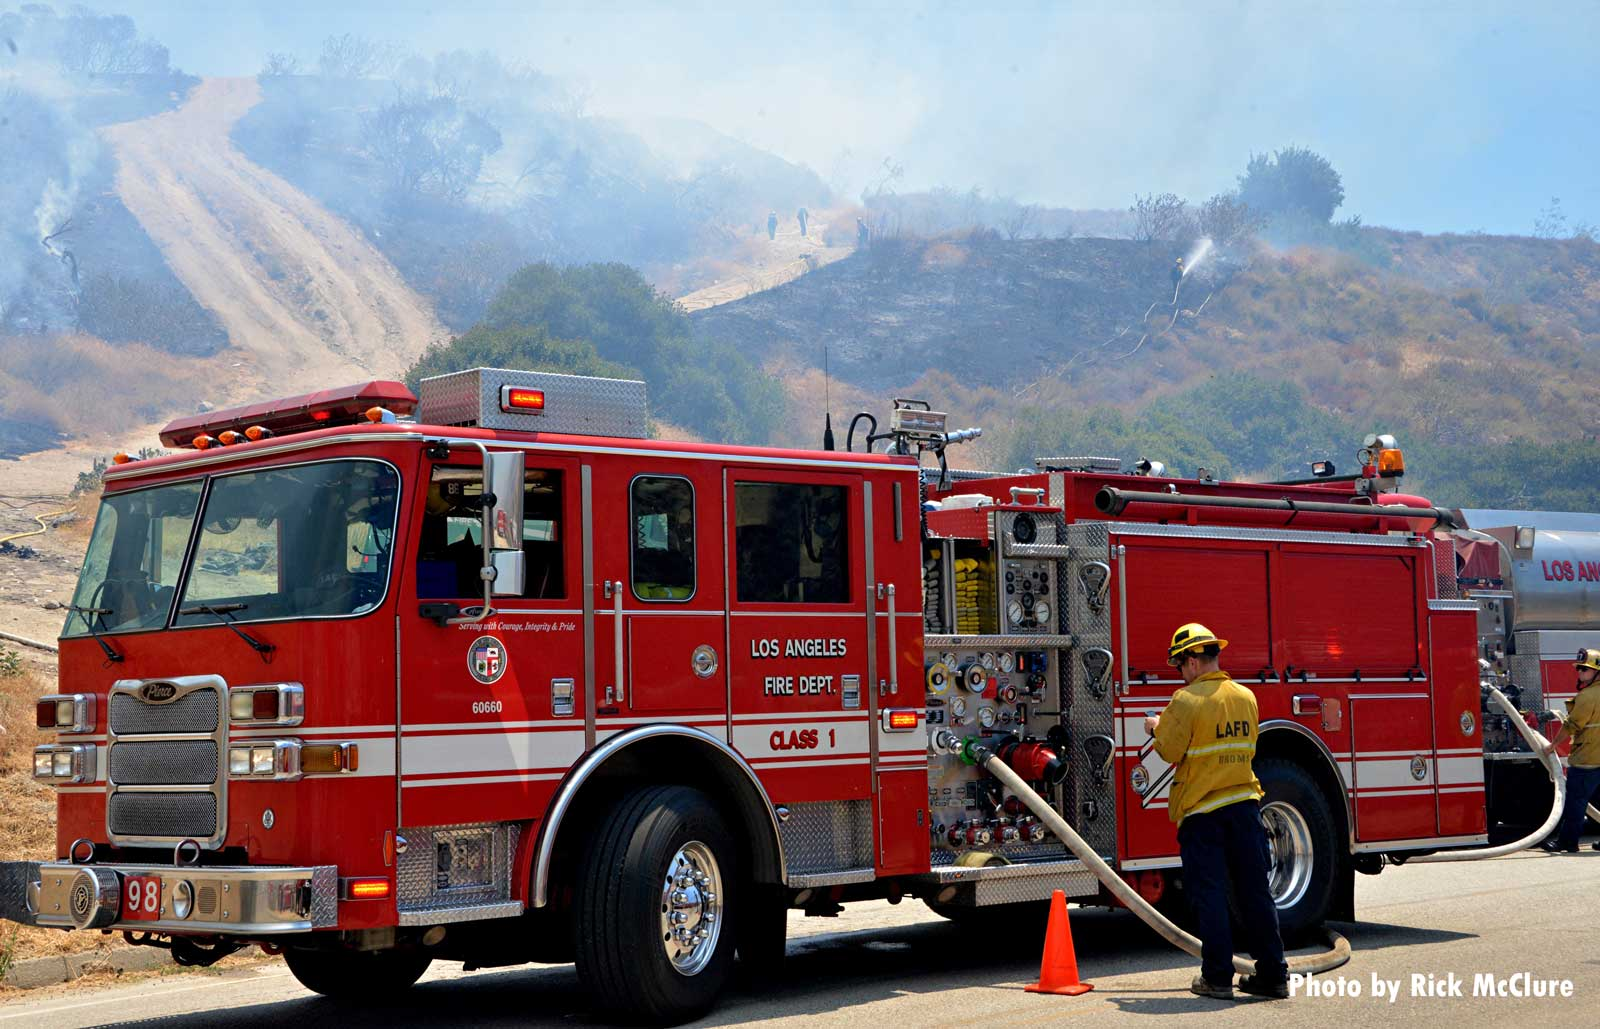 Fire apparatus at California wildfire